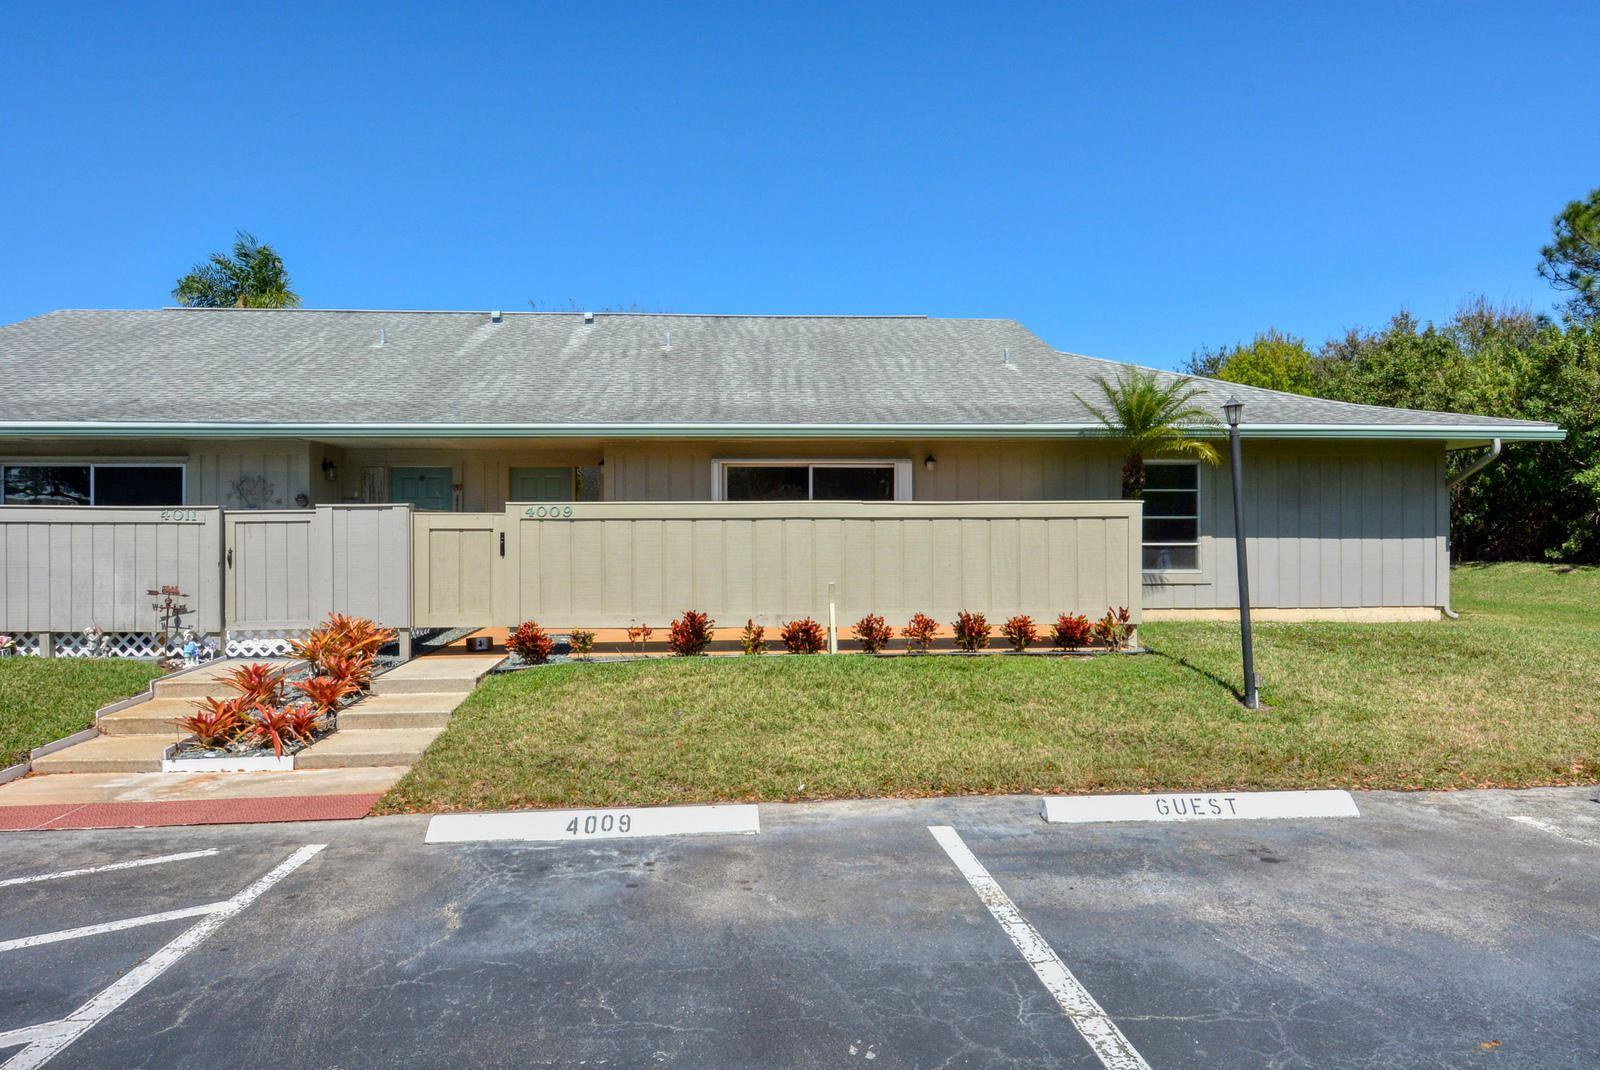 4009 NW Cinnamon Tree Circle, Jensen Beach, FL 34957 - #: RX-10695323